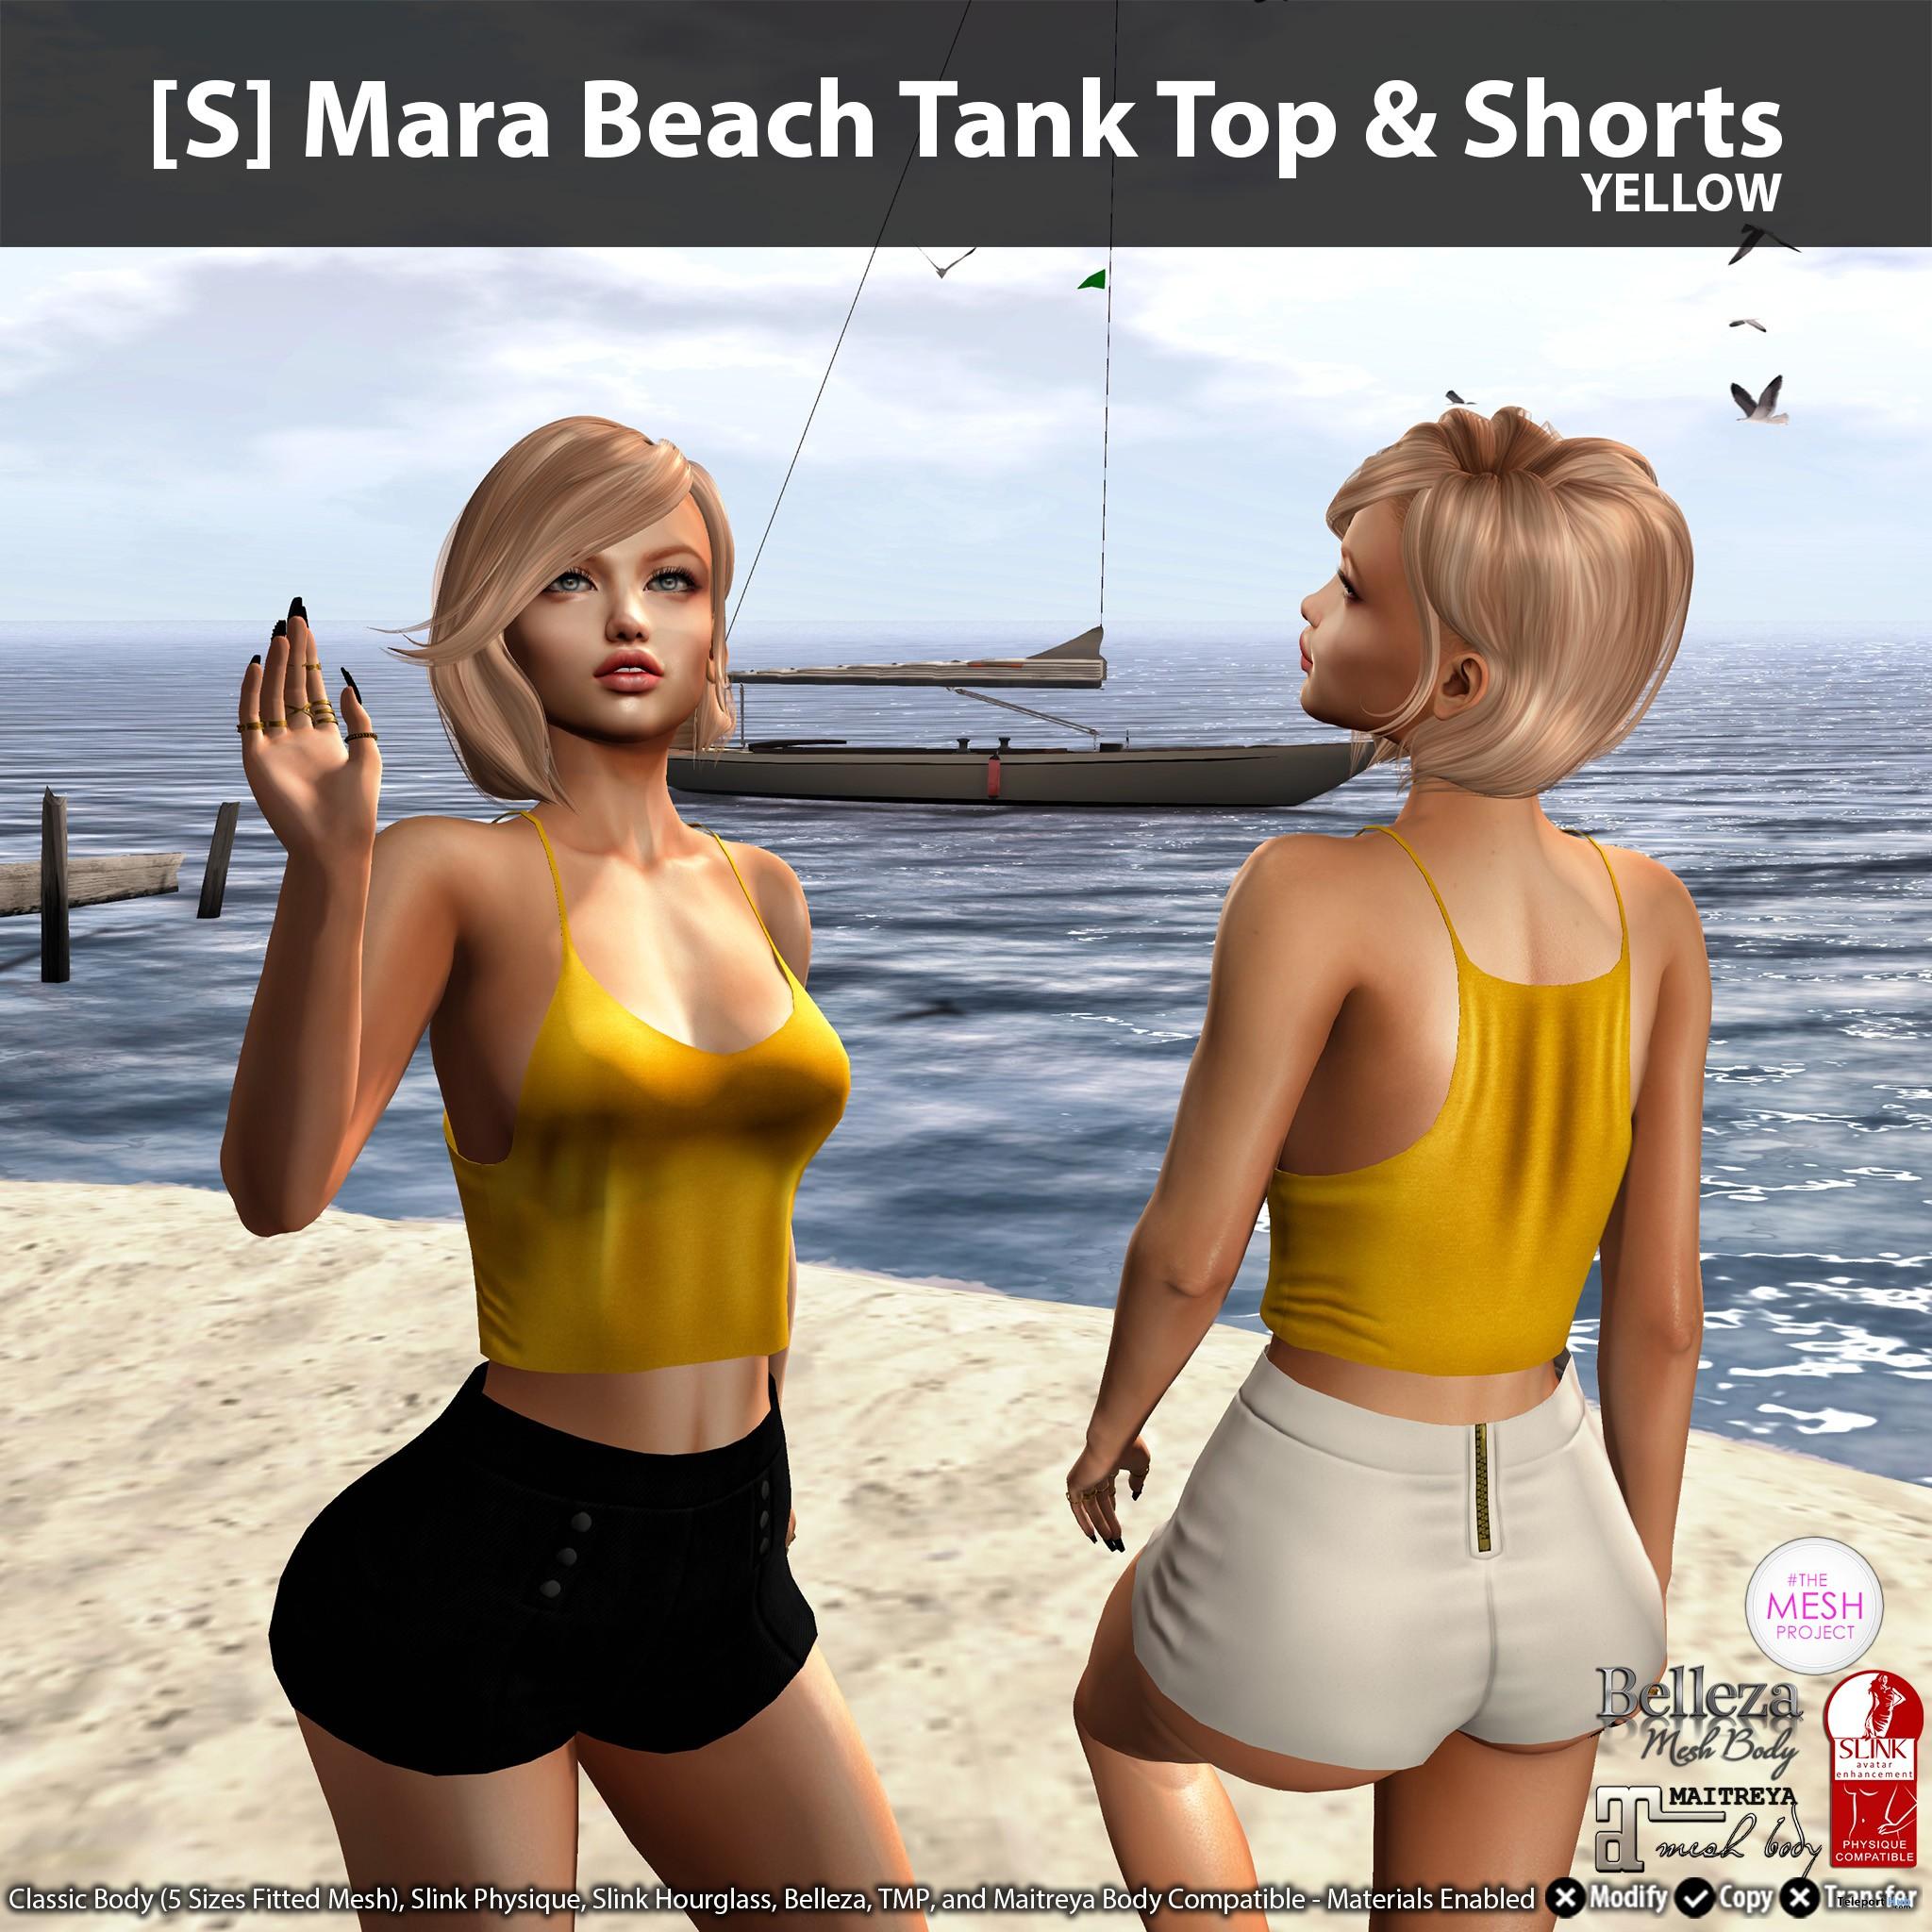 New Release: [S] Mara Beach Tank Top & Shorts by [satus Inc] - Teleport Hub - teleporthub.com